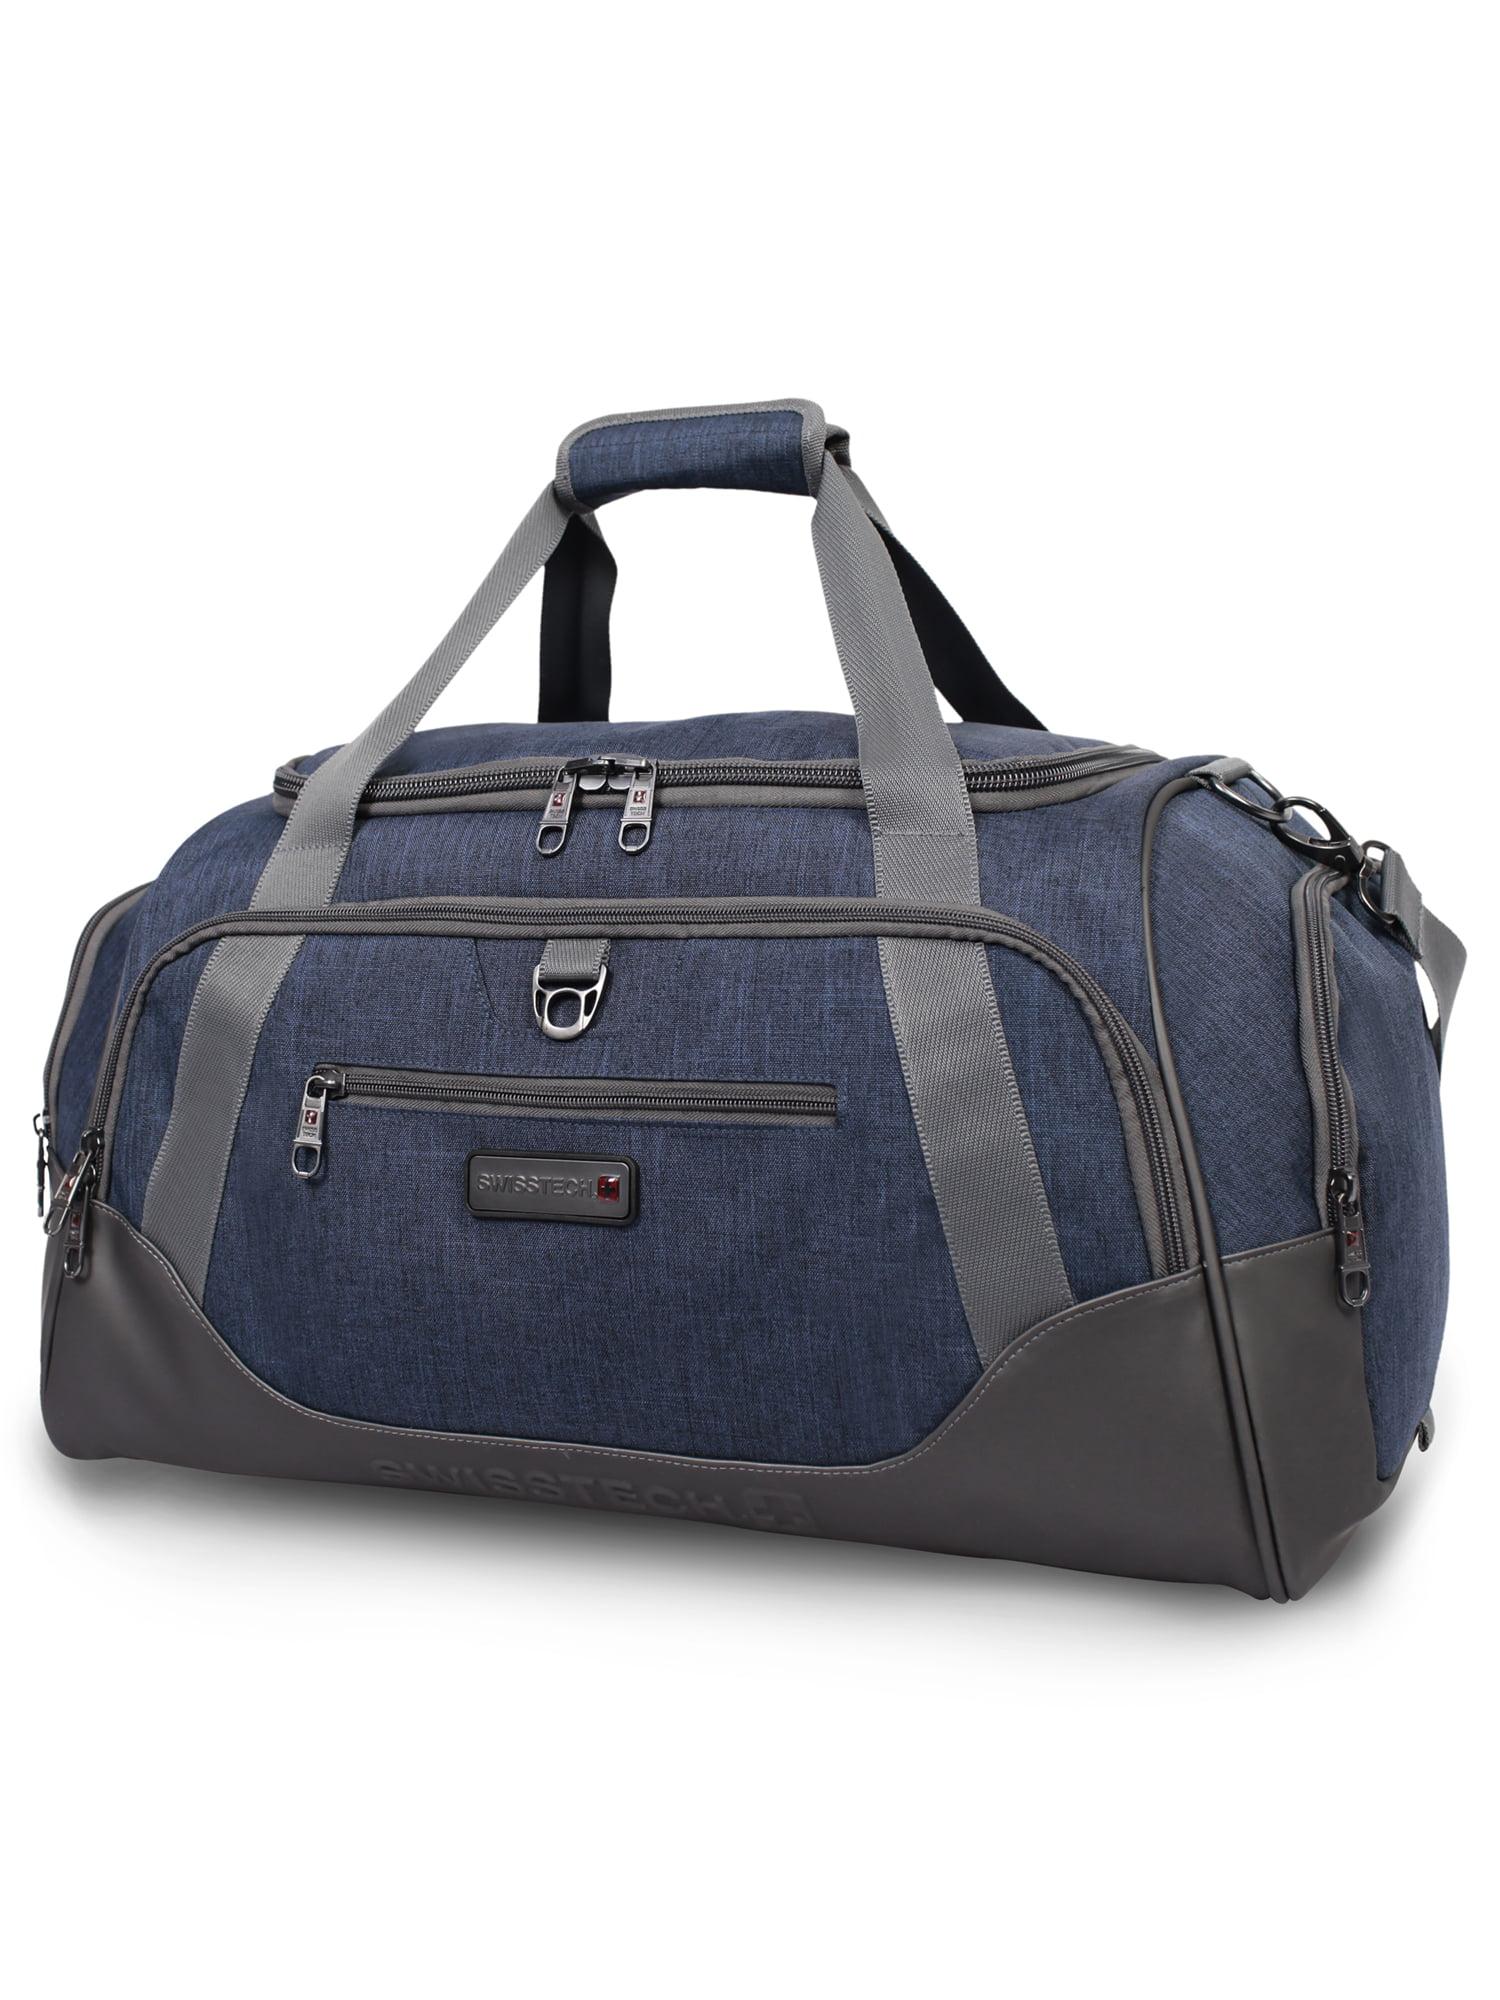 Travel Luggage Duffle Bag Lightweight Portable Handbag Hot Air Balloon Pattern Large Capacity Waterproof Foldable Storage Tote